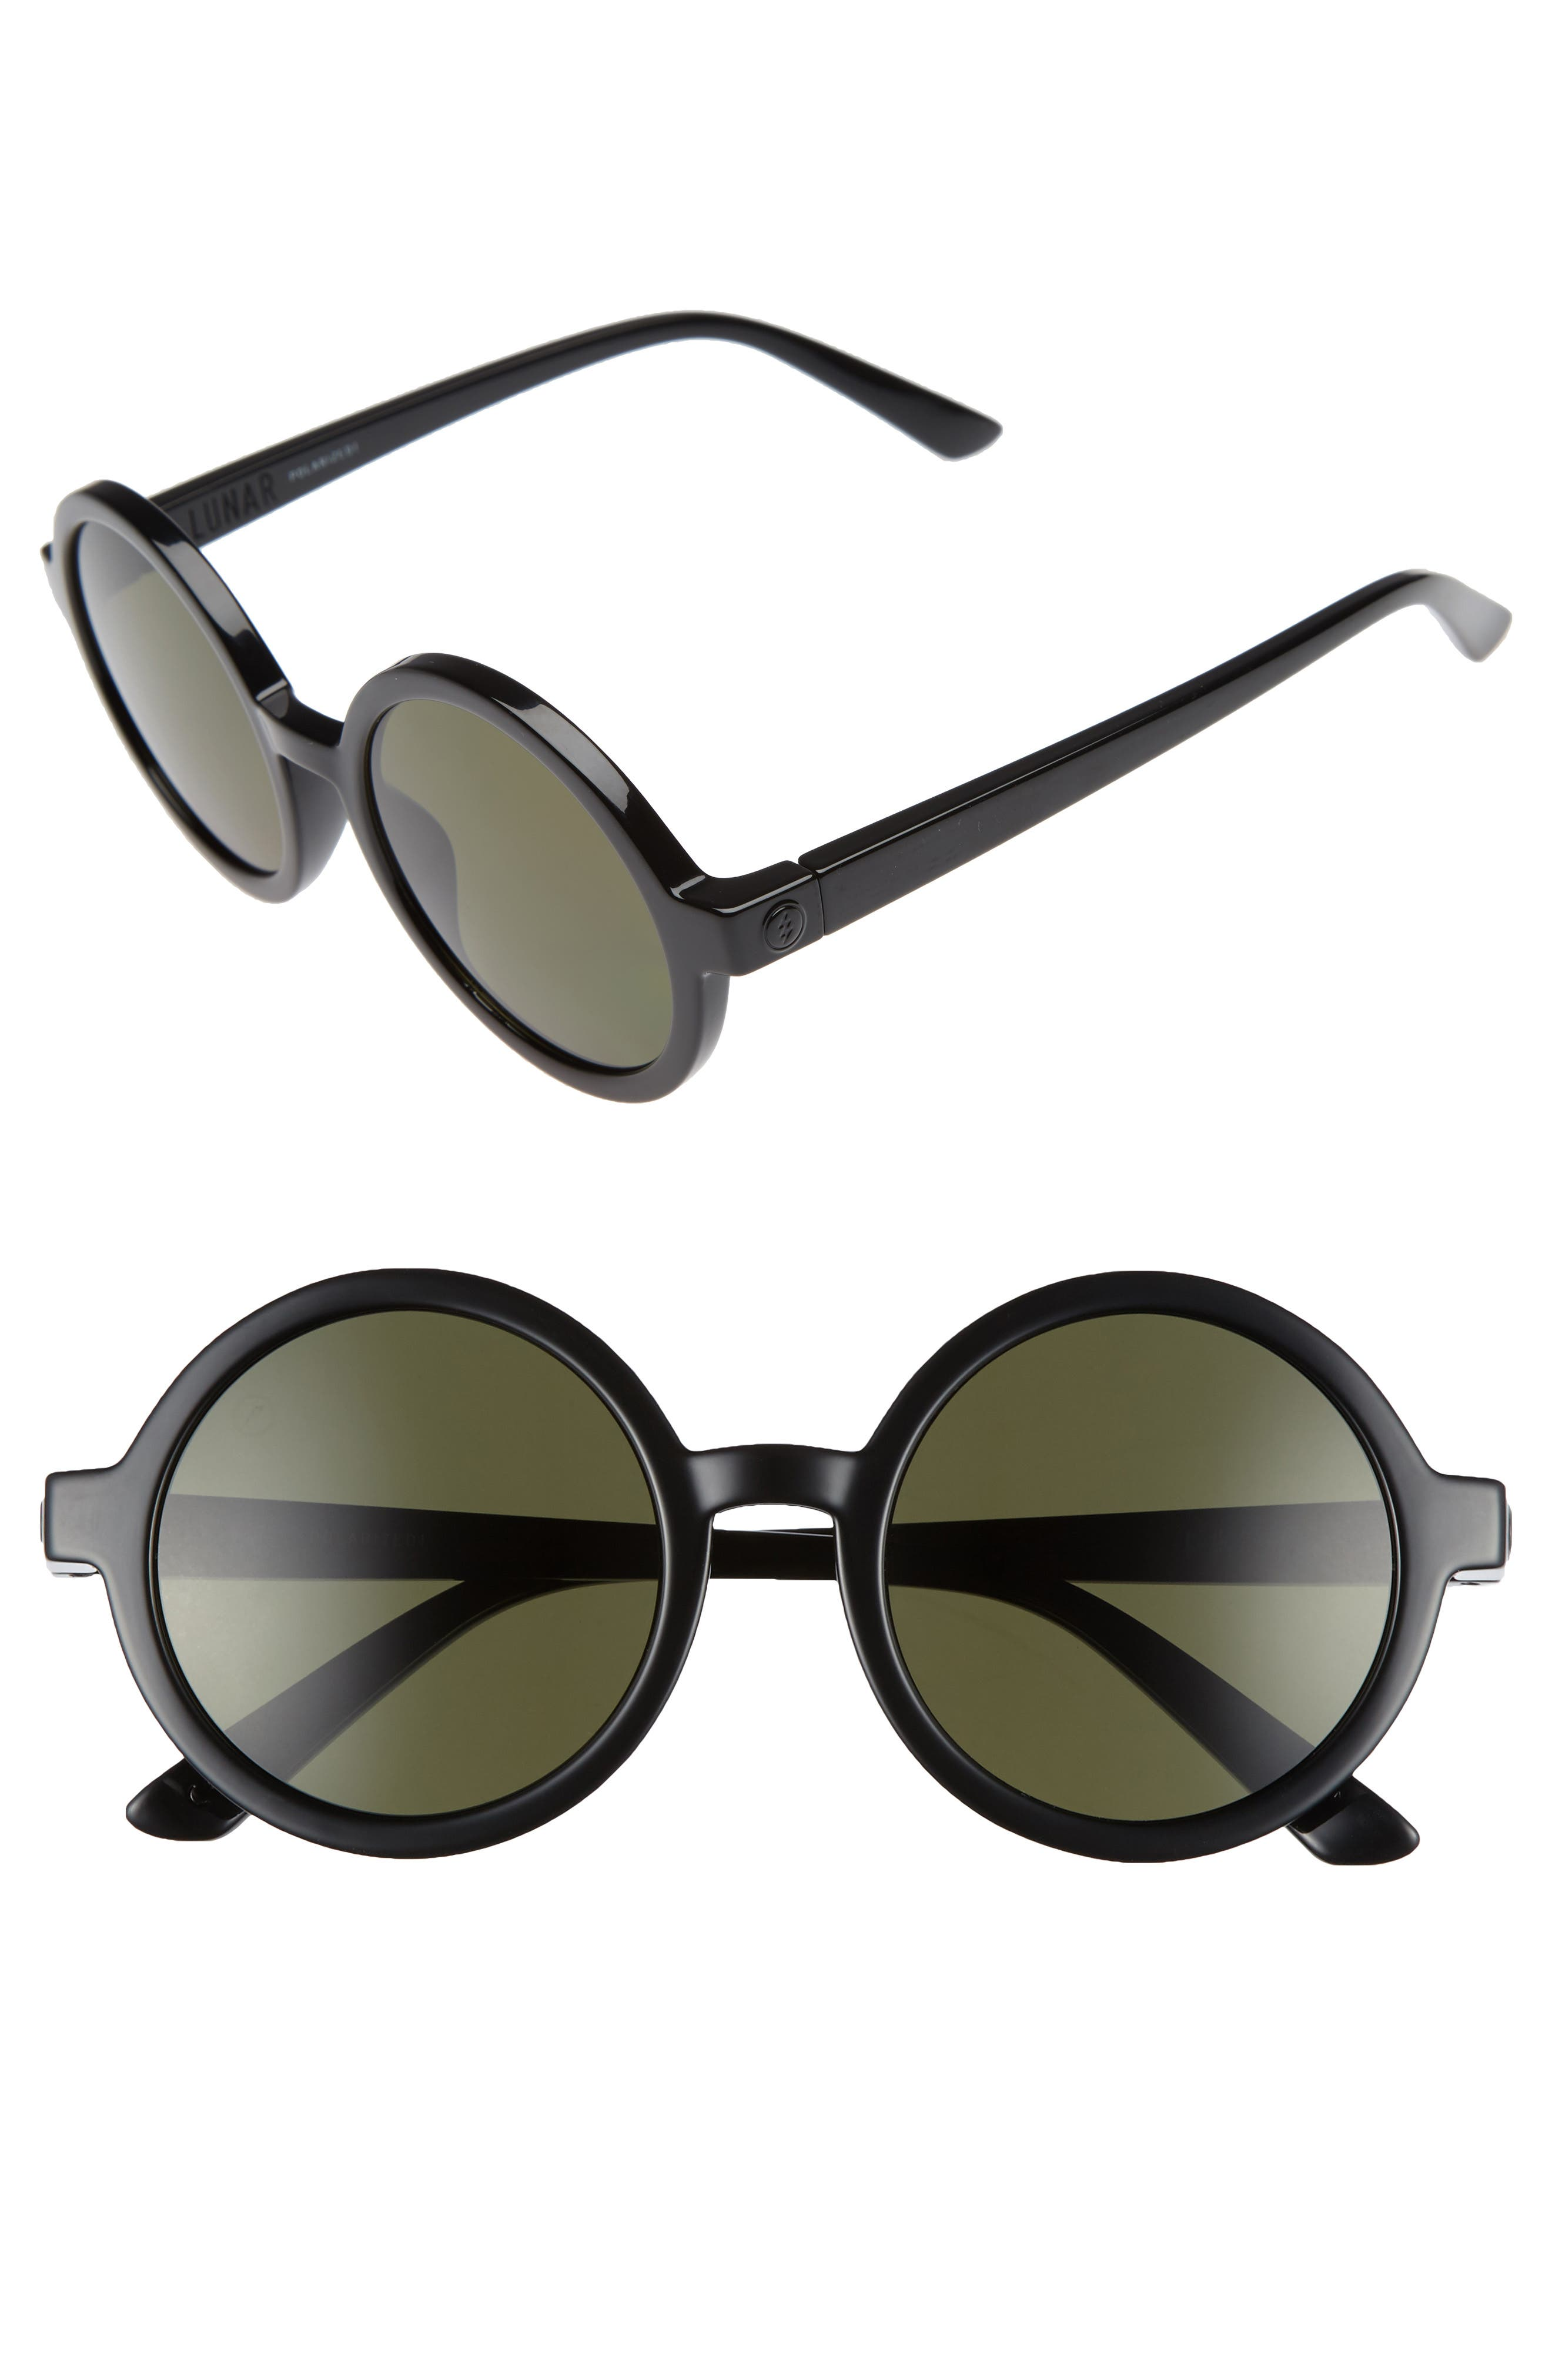 Lunar 51mm Round Polarized Sunglasses,                         Main,                         color, Gloss Black/ Grey Polar